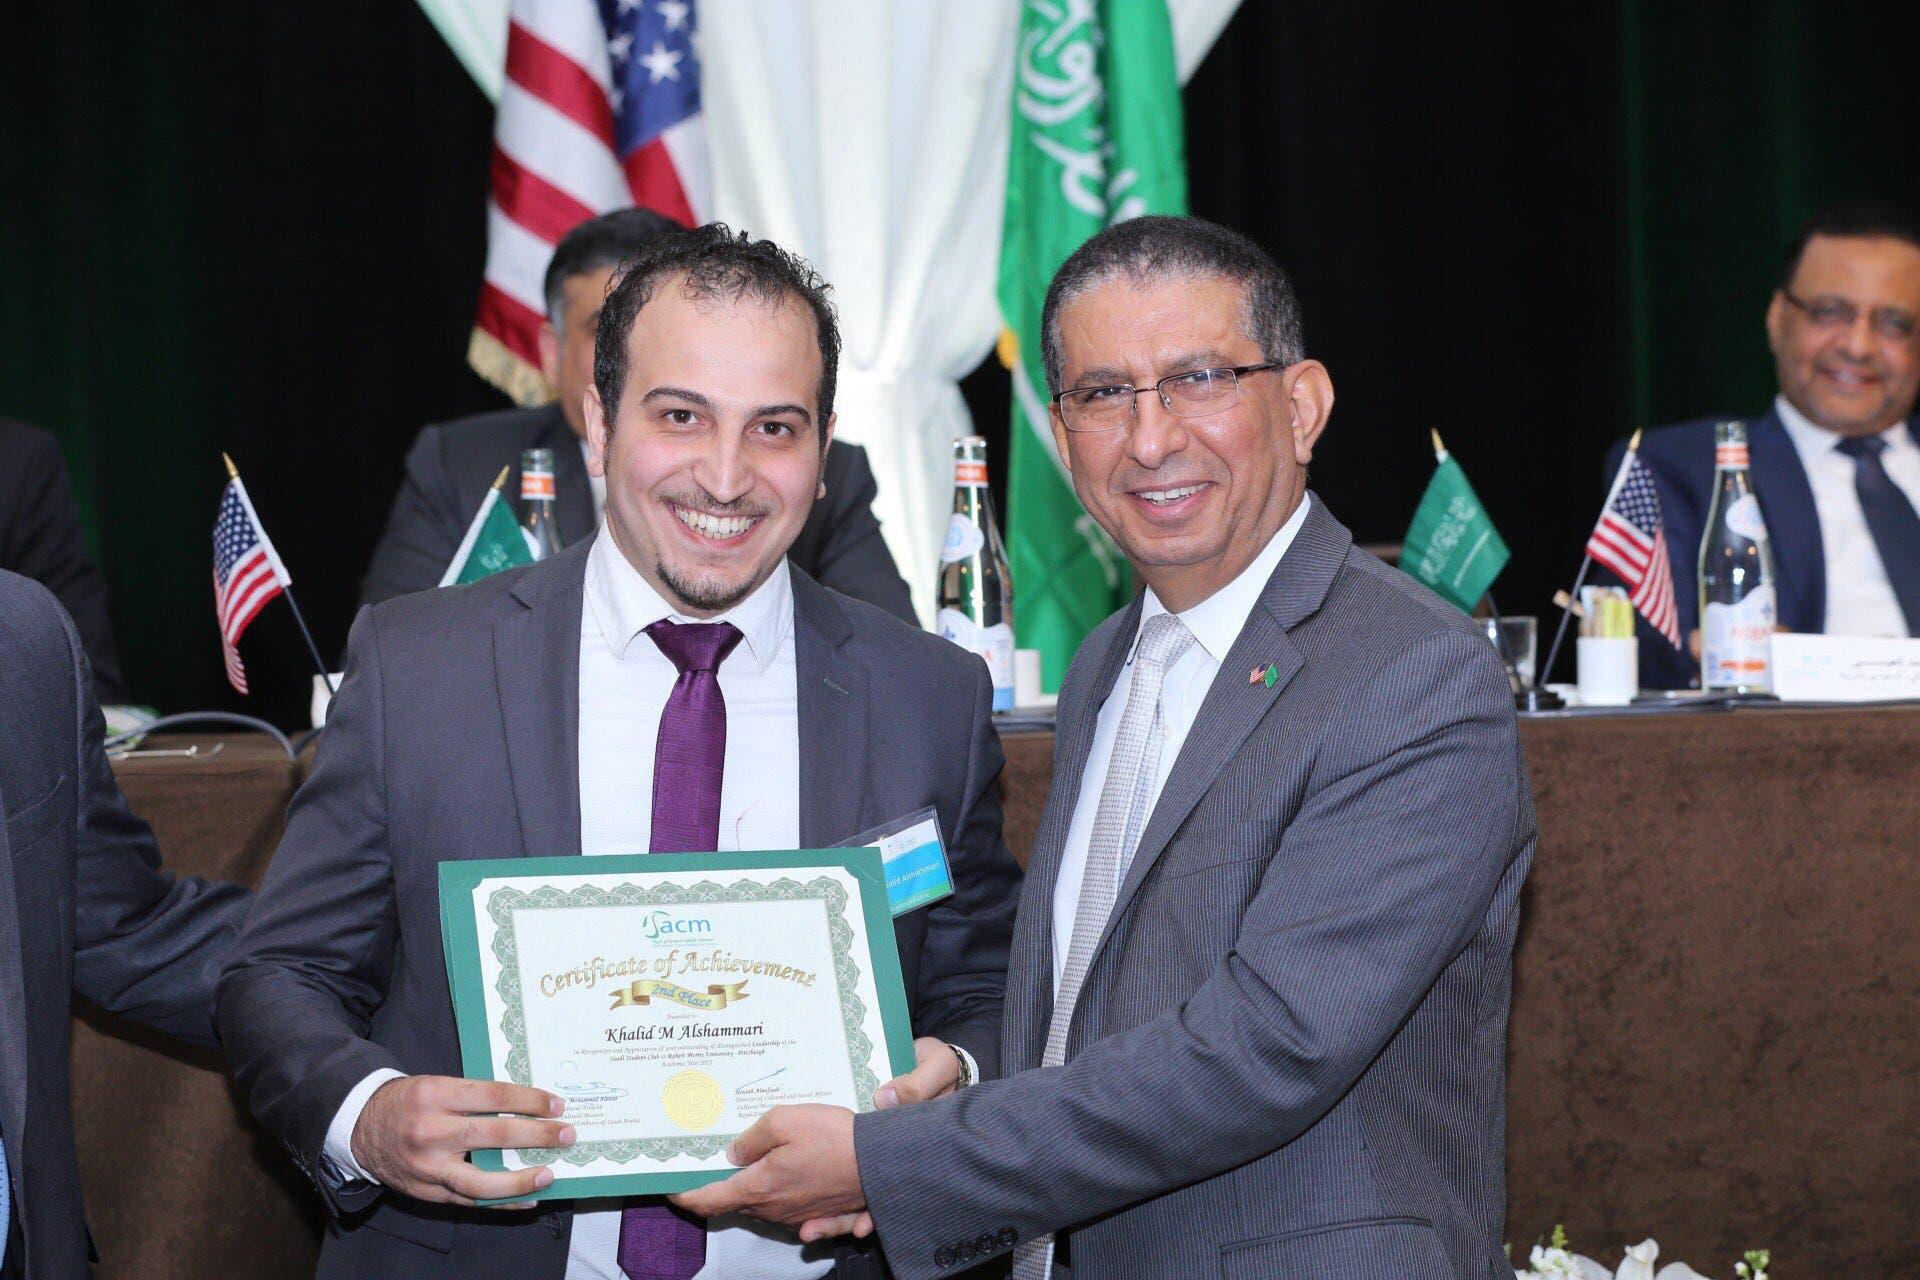 Saudi student Khalid al-Qhes al-Shammeri awarded by his university for his Saudi club's efforts. (Supplied)